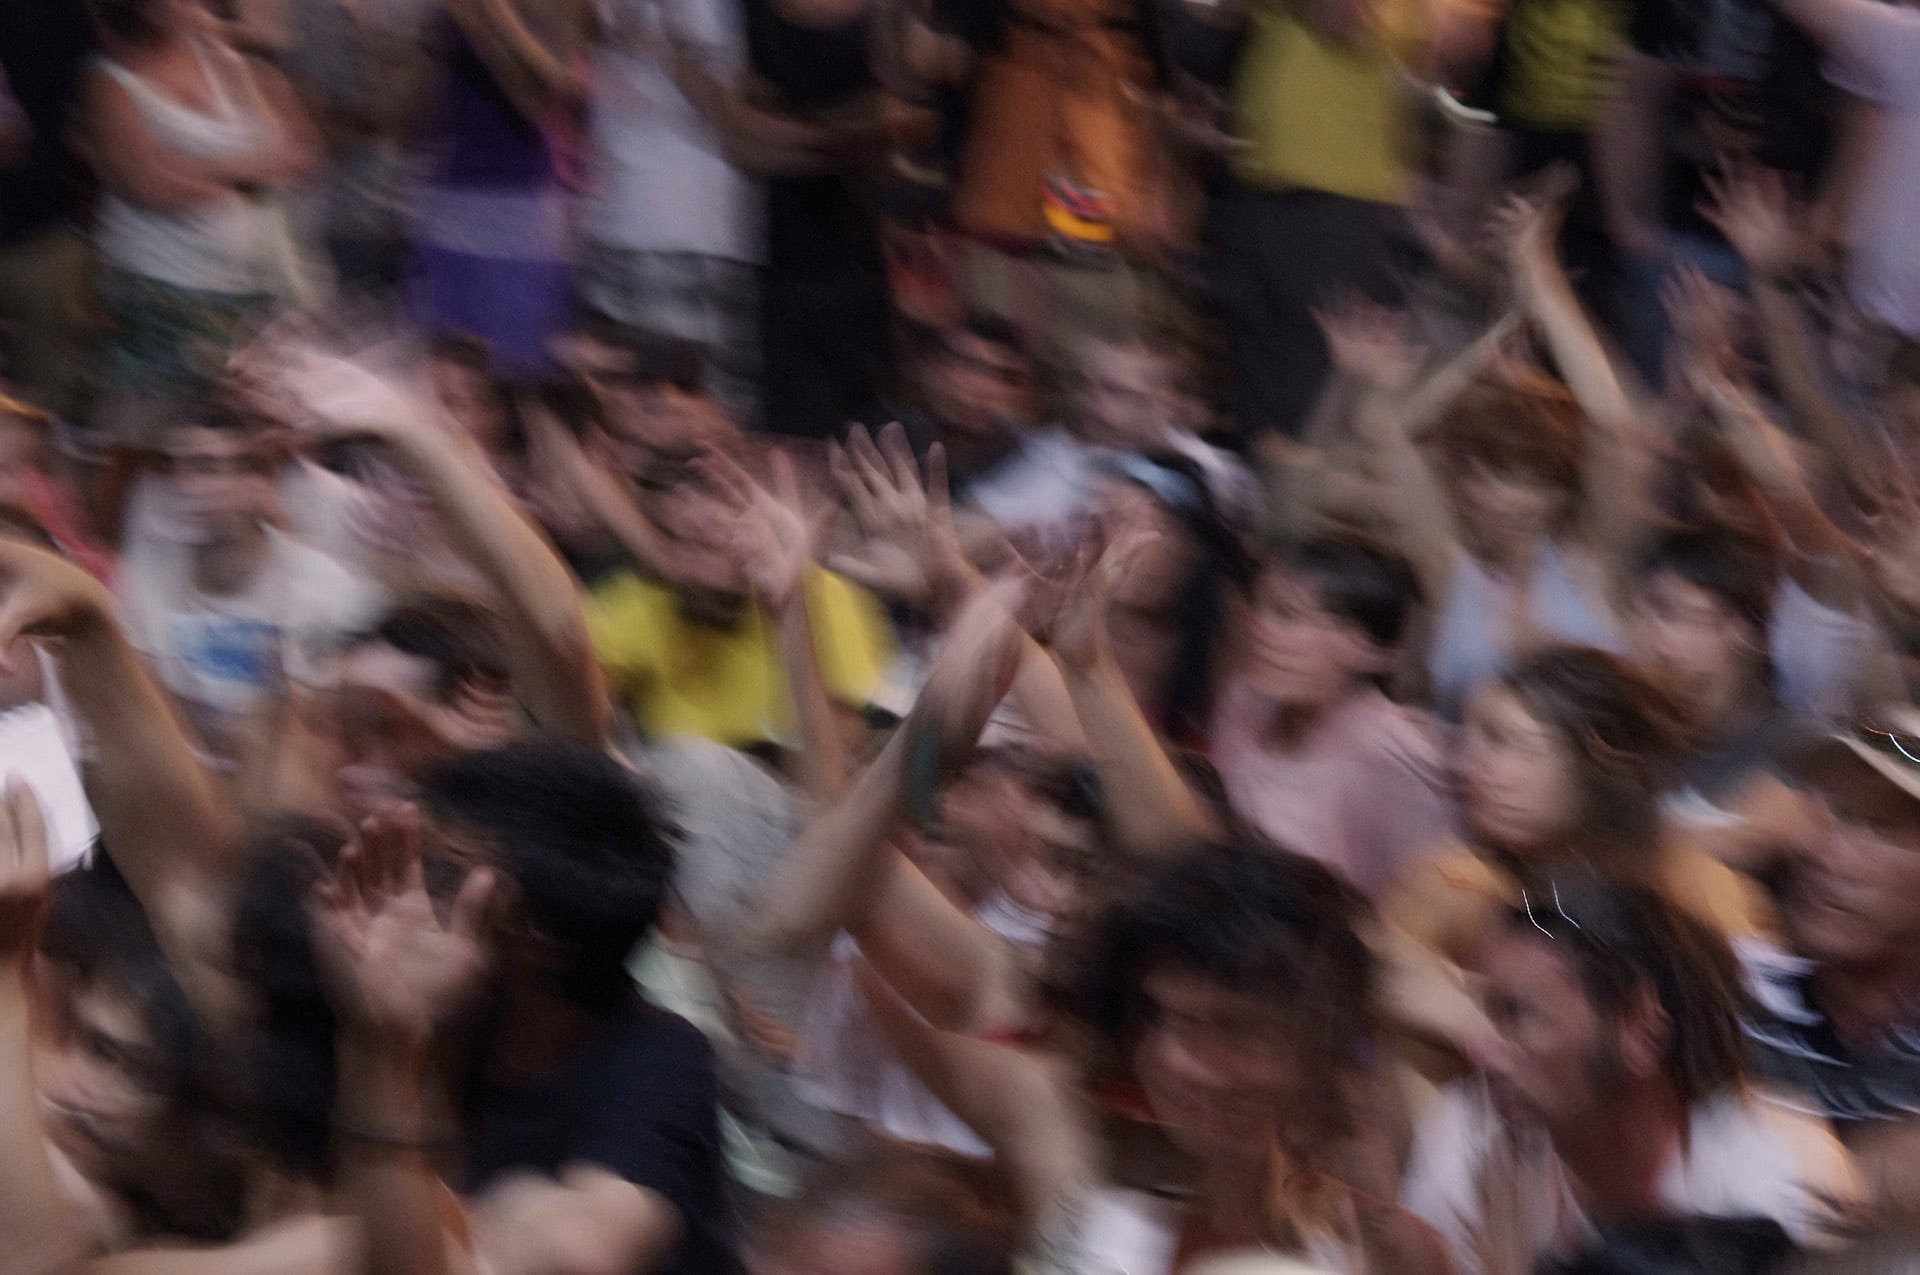 AudienceFX